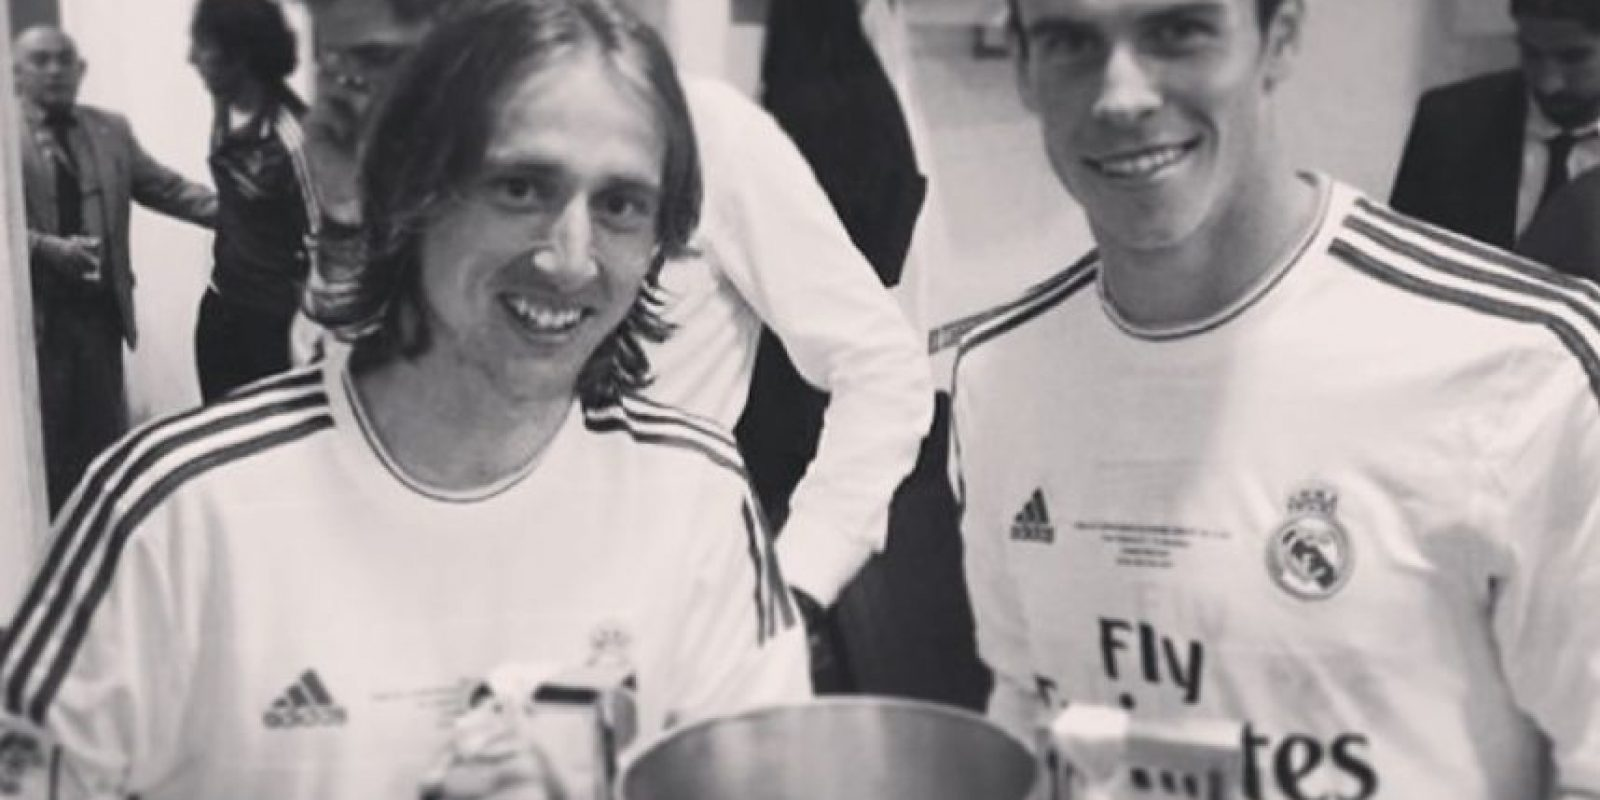 Luka Modrić y Gareth Bale Foto:instagram.com/garethbale11